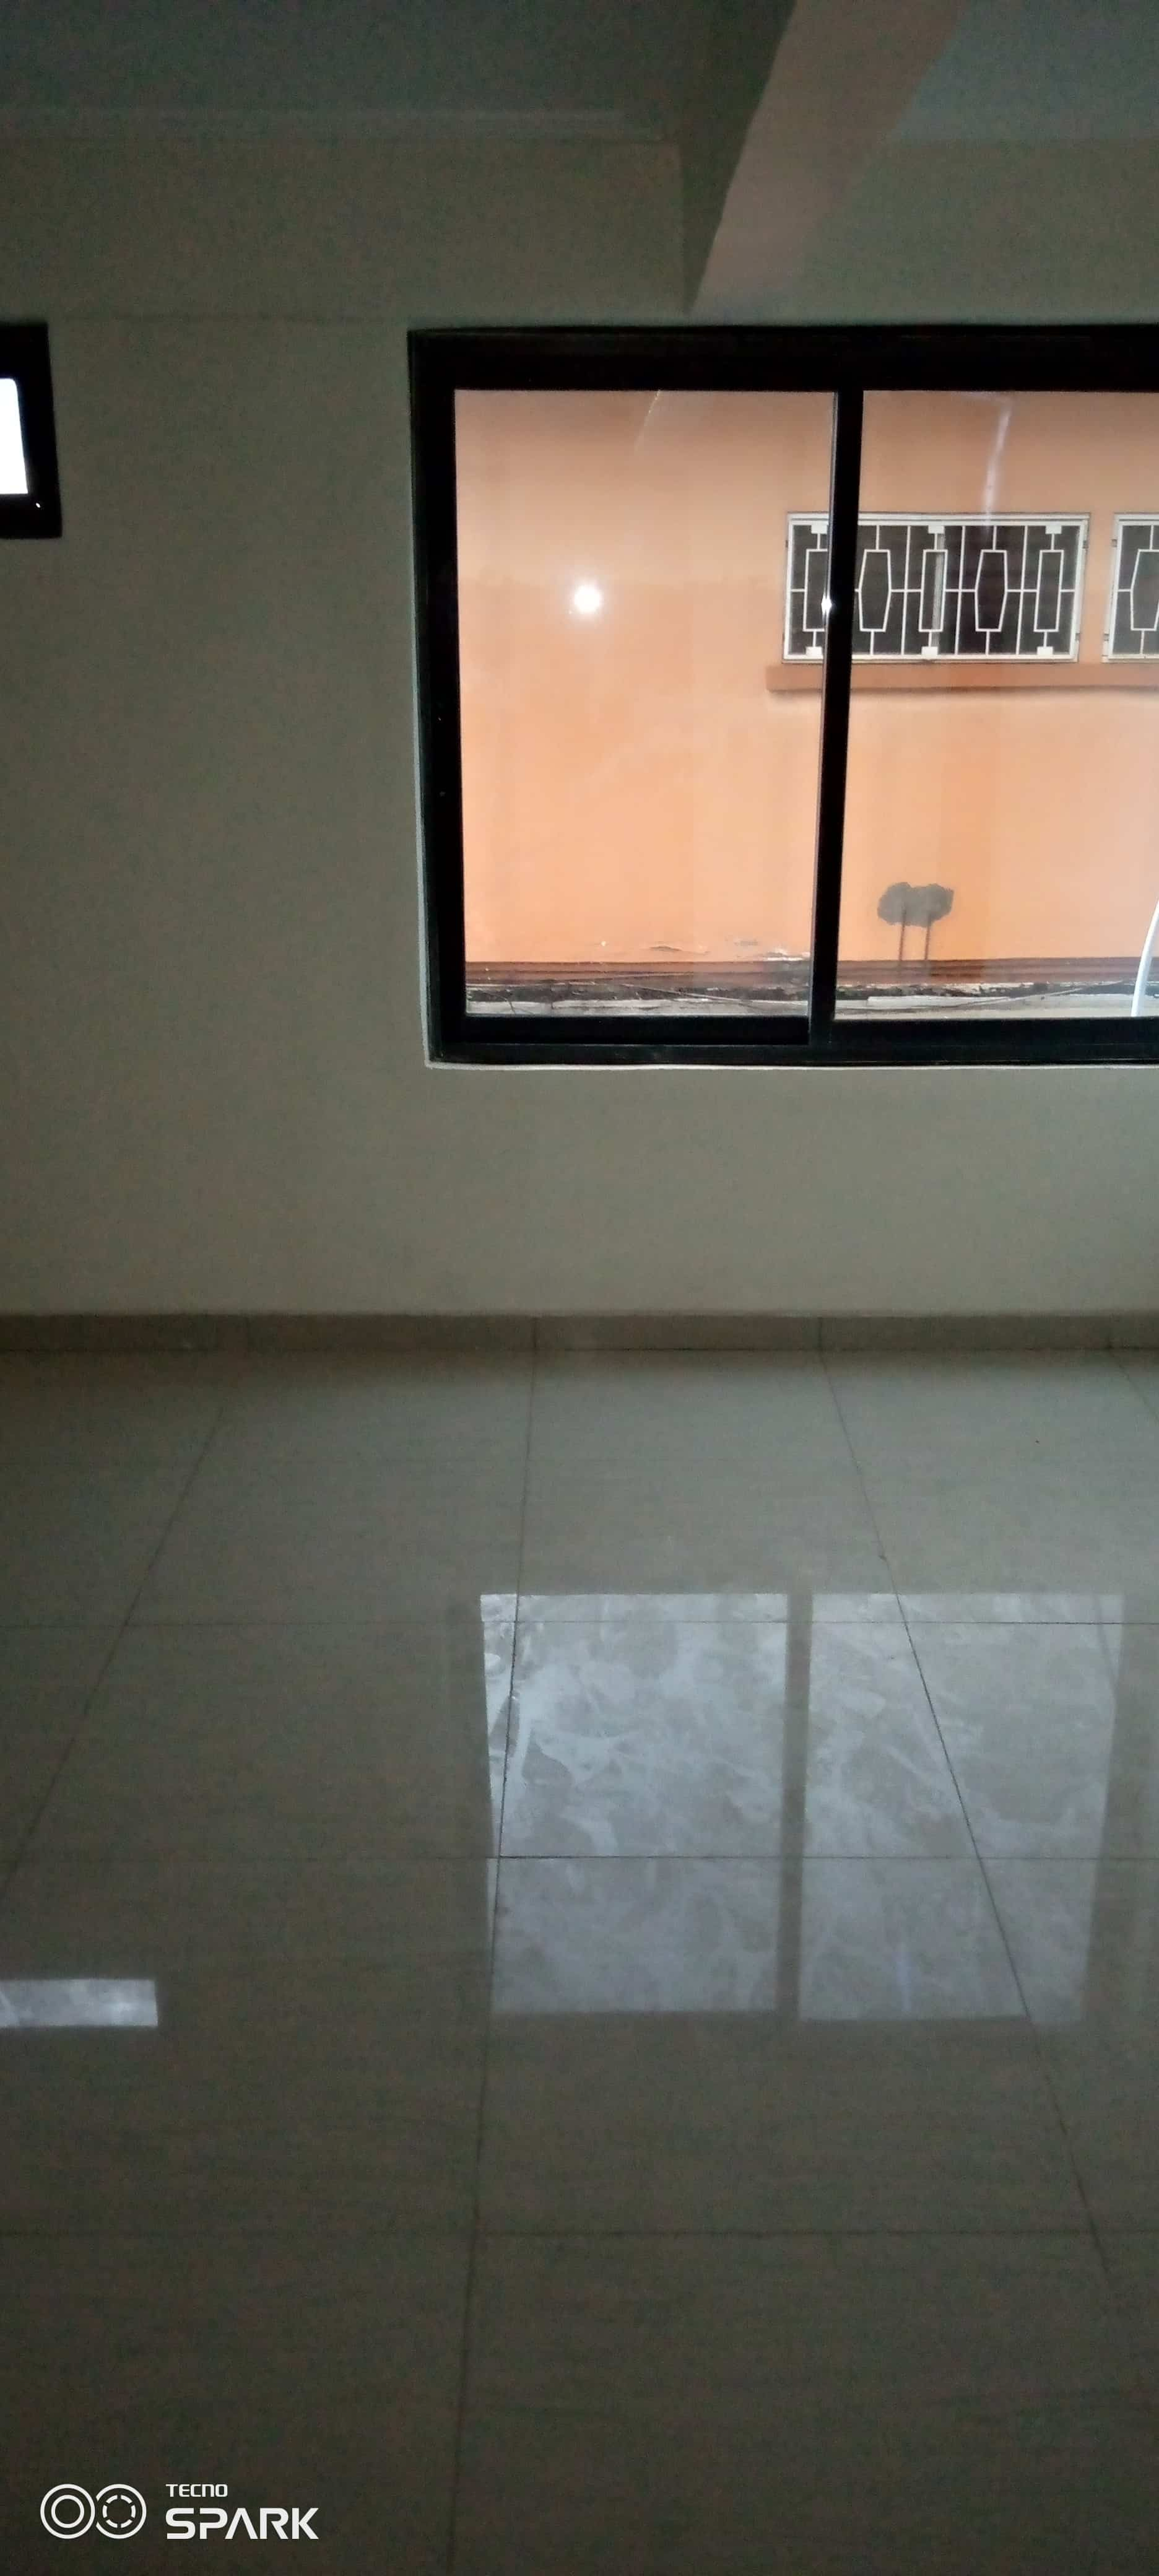 Office to rent at Yaoundé, Bastos, Pas loin de l'ambassade - 50 m2 - 150 000 FCFA